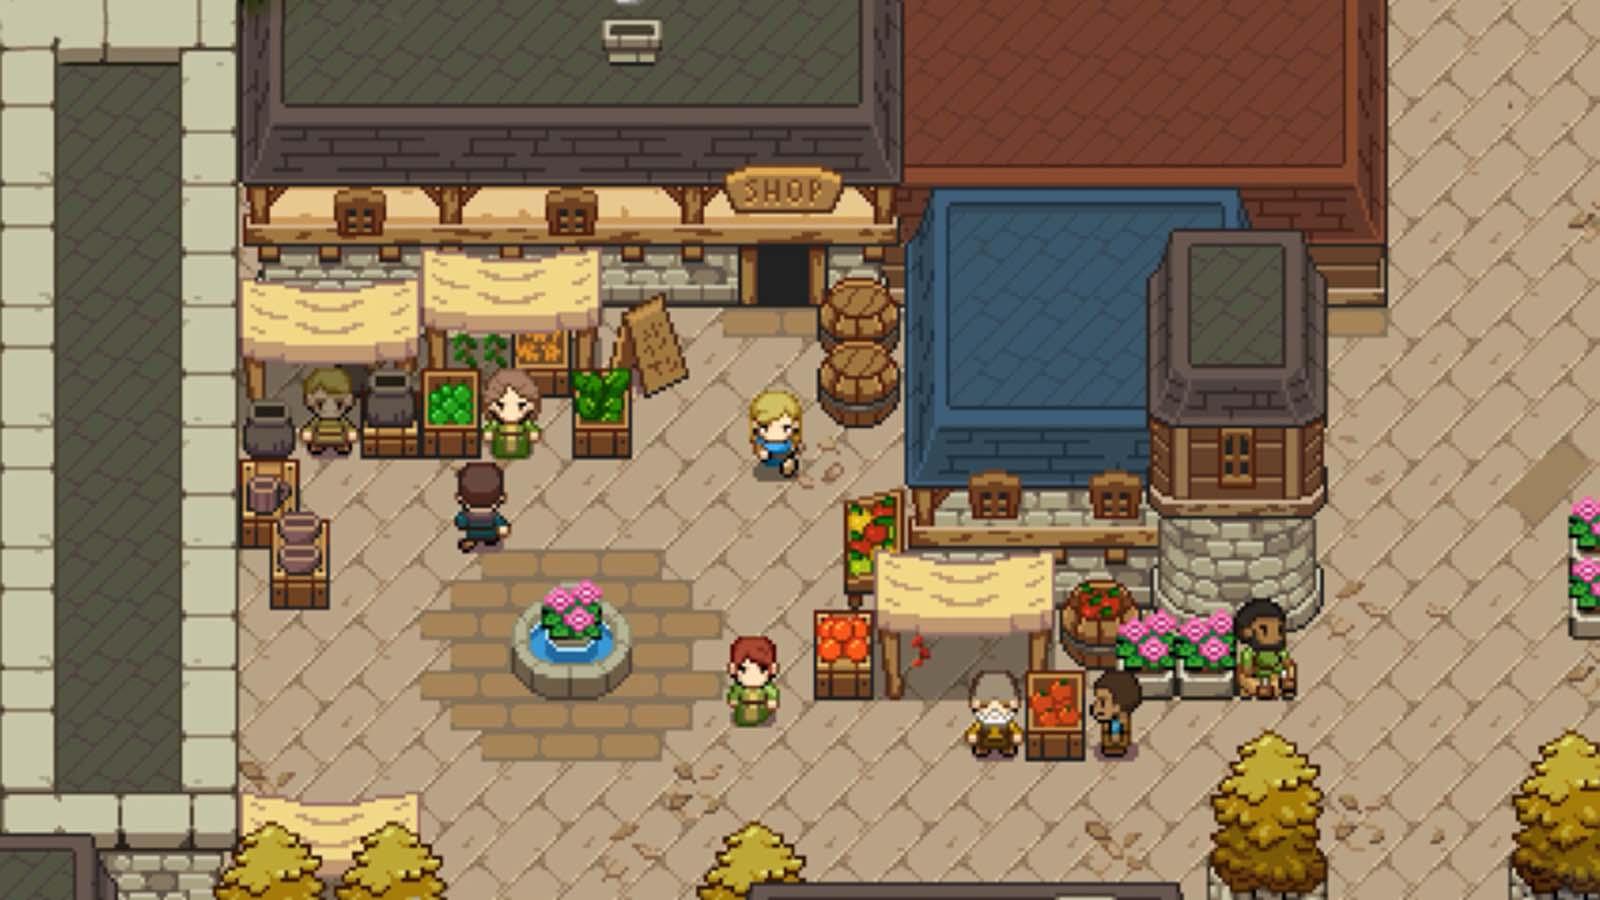 Pixel-Art Action RPG 'Ocean's Heart' is Coming to Steam